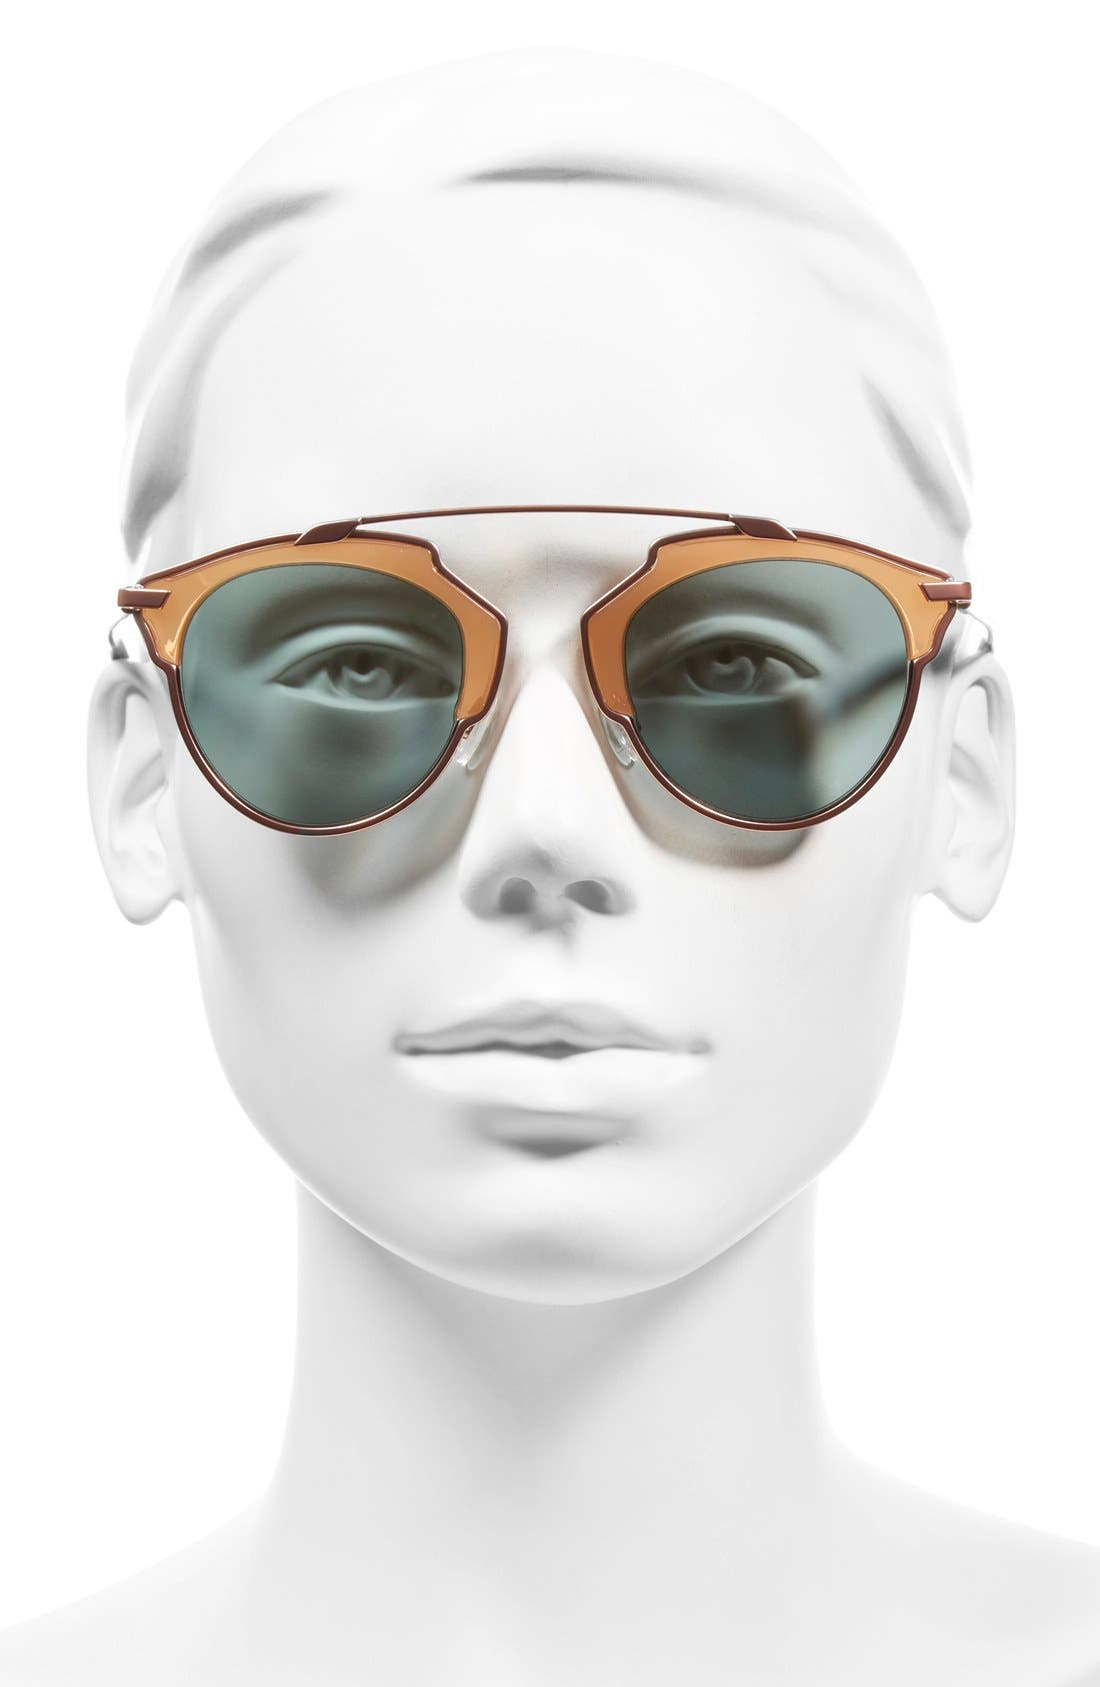 So Real 48mm Brow Bar Sunglasses,                             Alternate thumbnail 47, color,